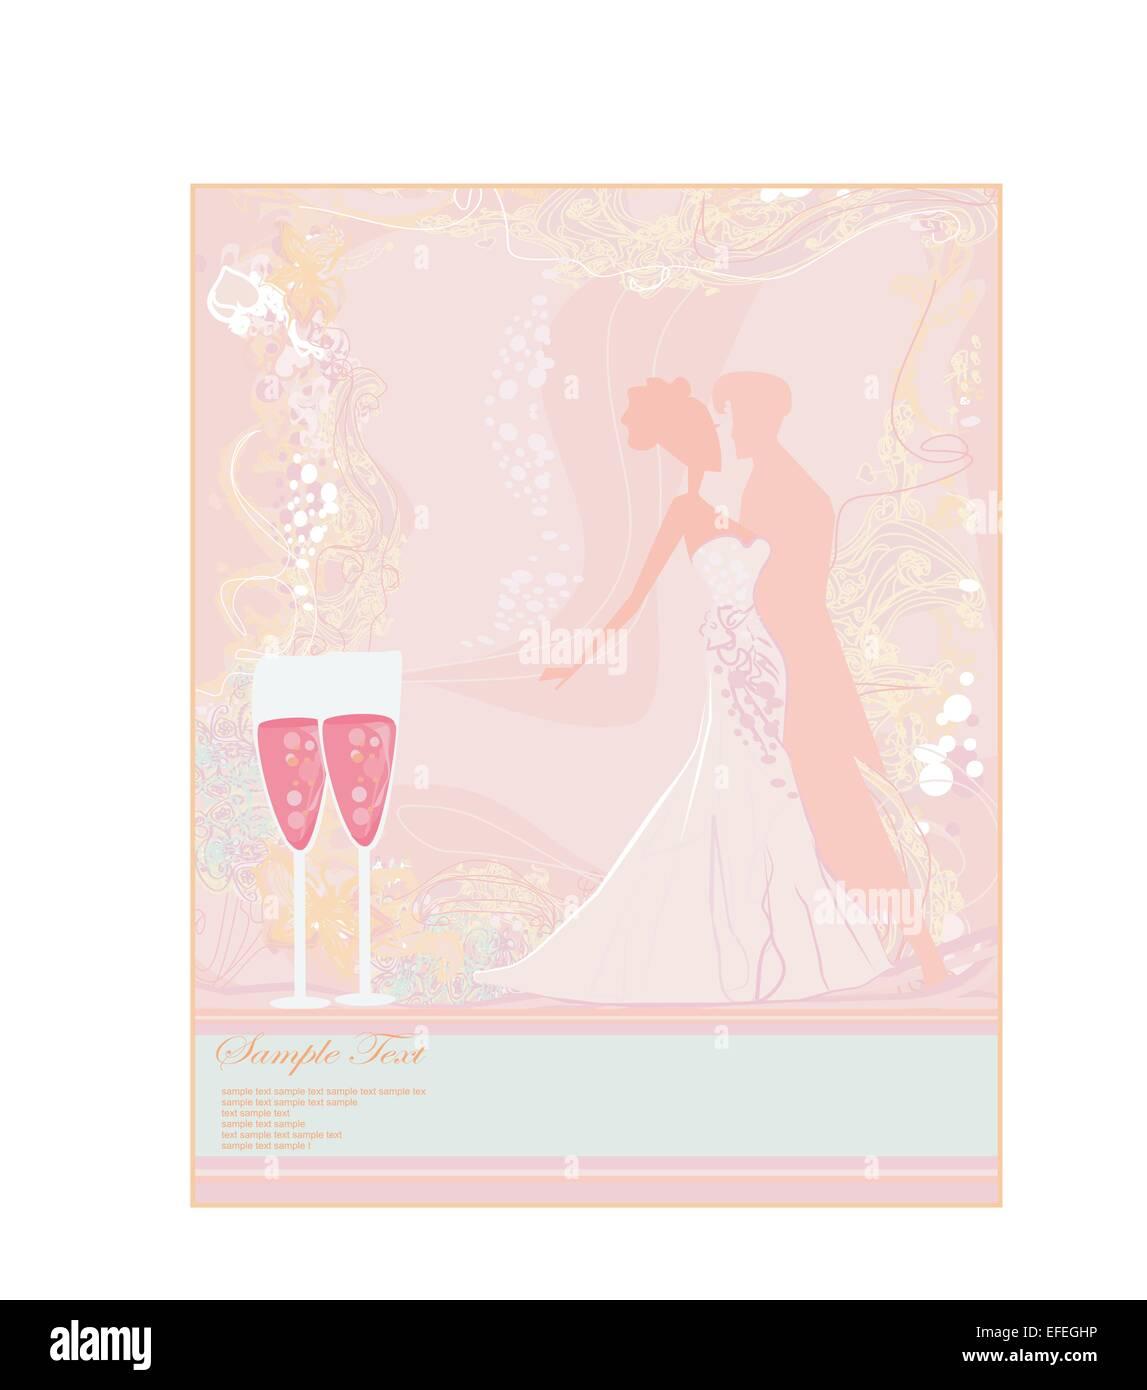 Women Dance Wedding Stock Vector Images Alamy Ballroom Steps Diagram Dancers Invitation